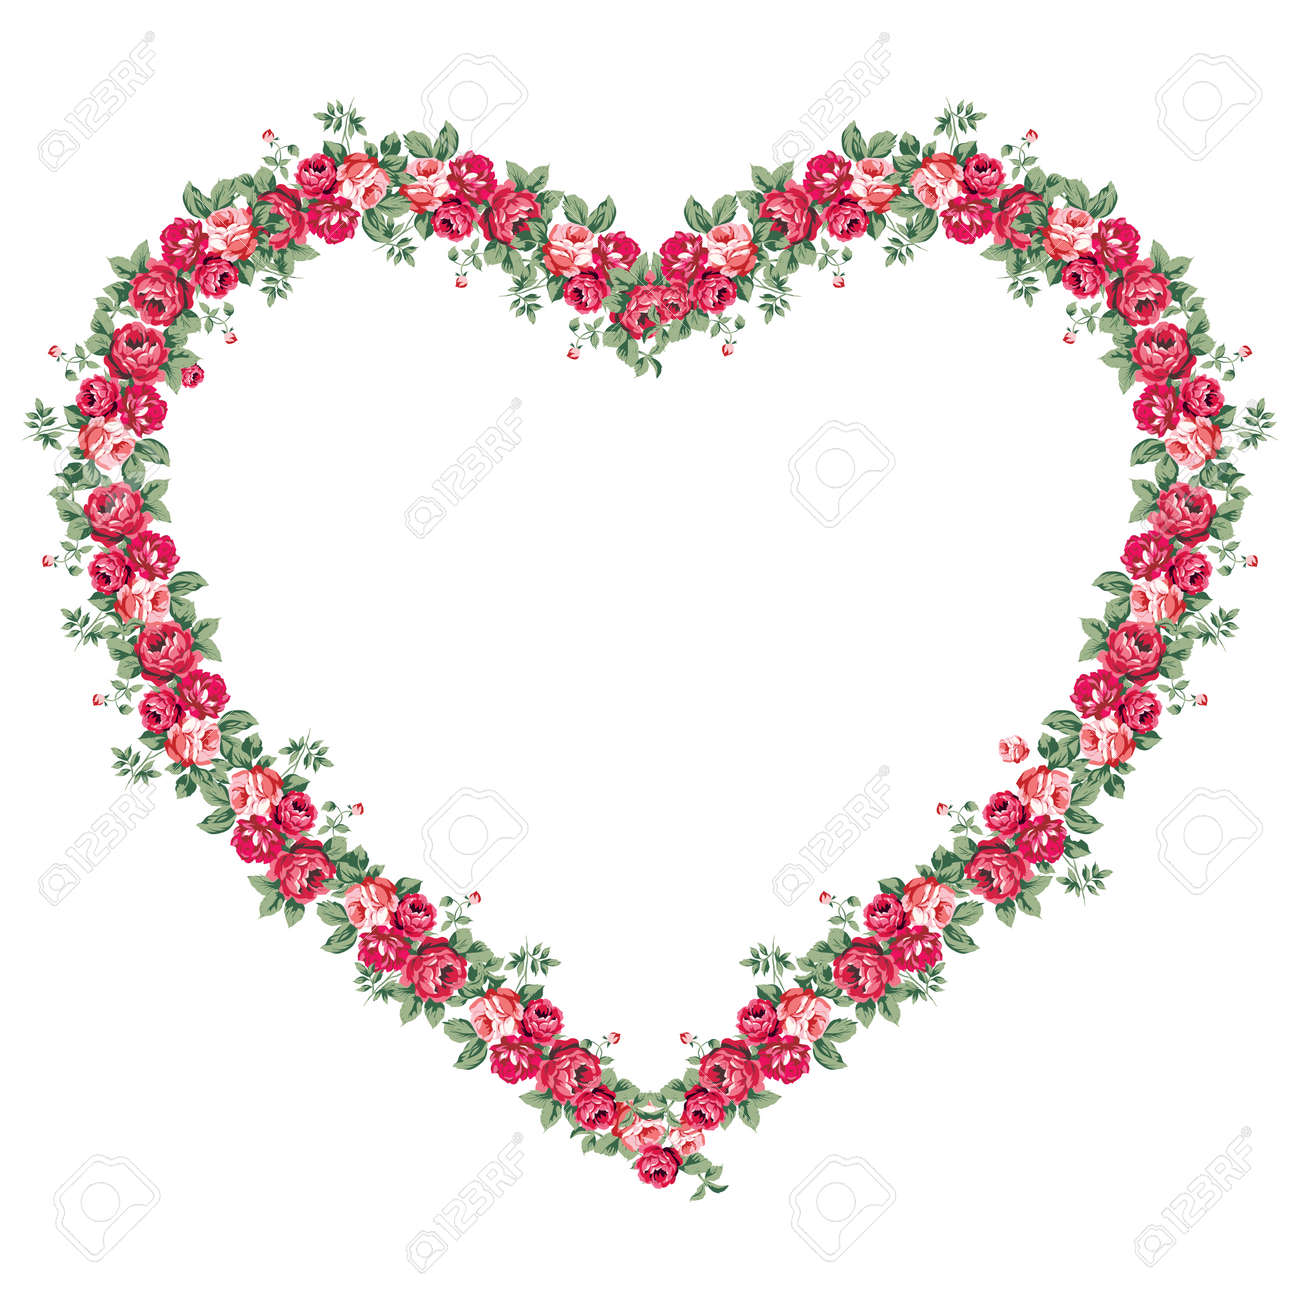 Marcos Elegantes Para Fotos. Leaves Roses Vintage Design Motif ...